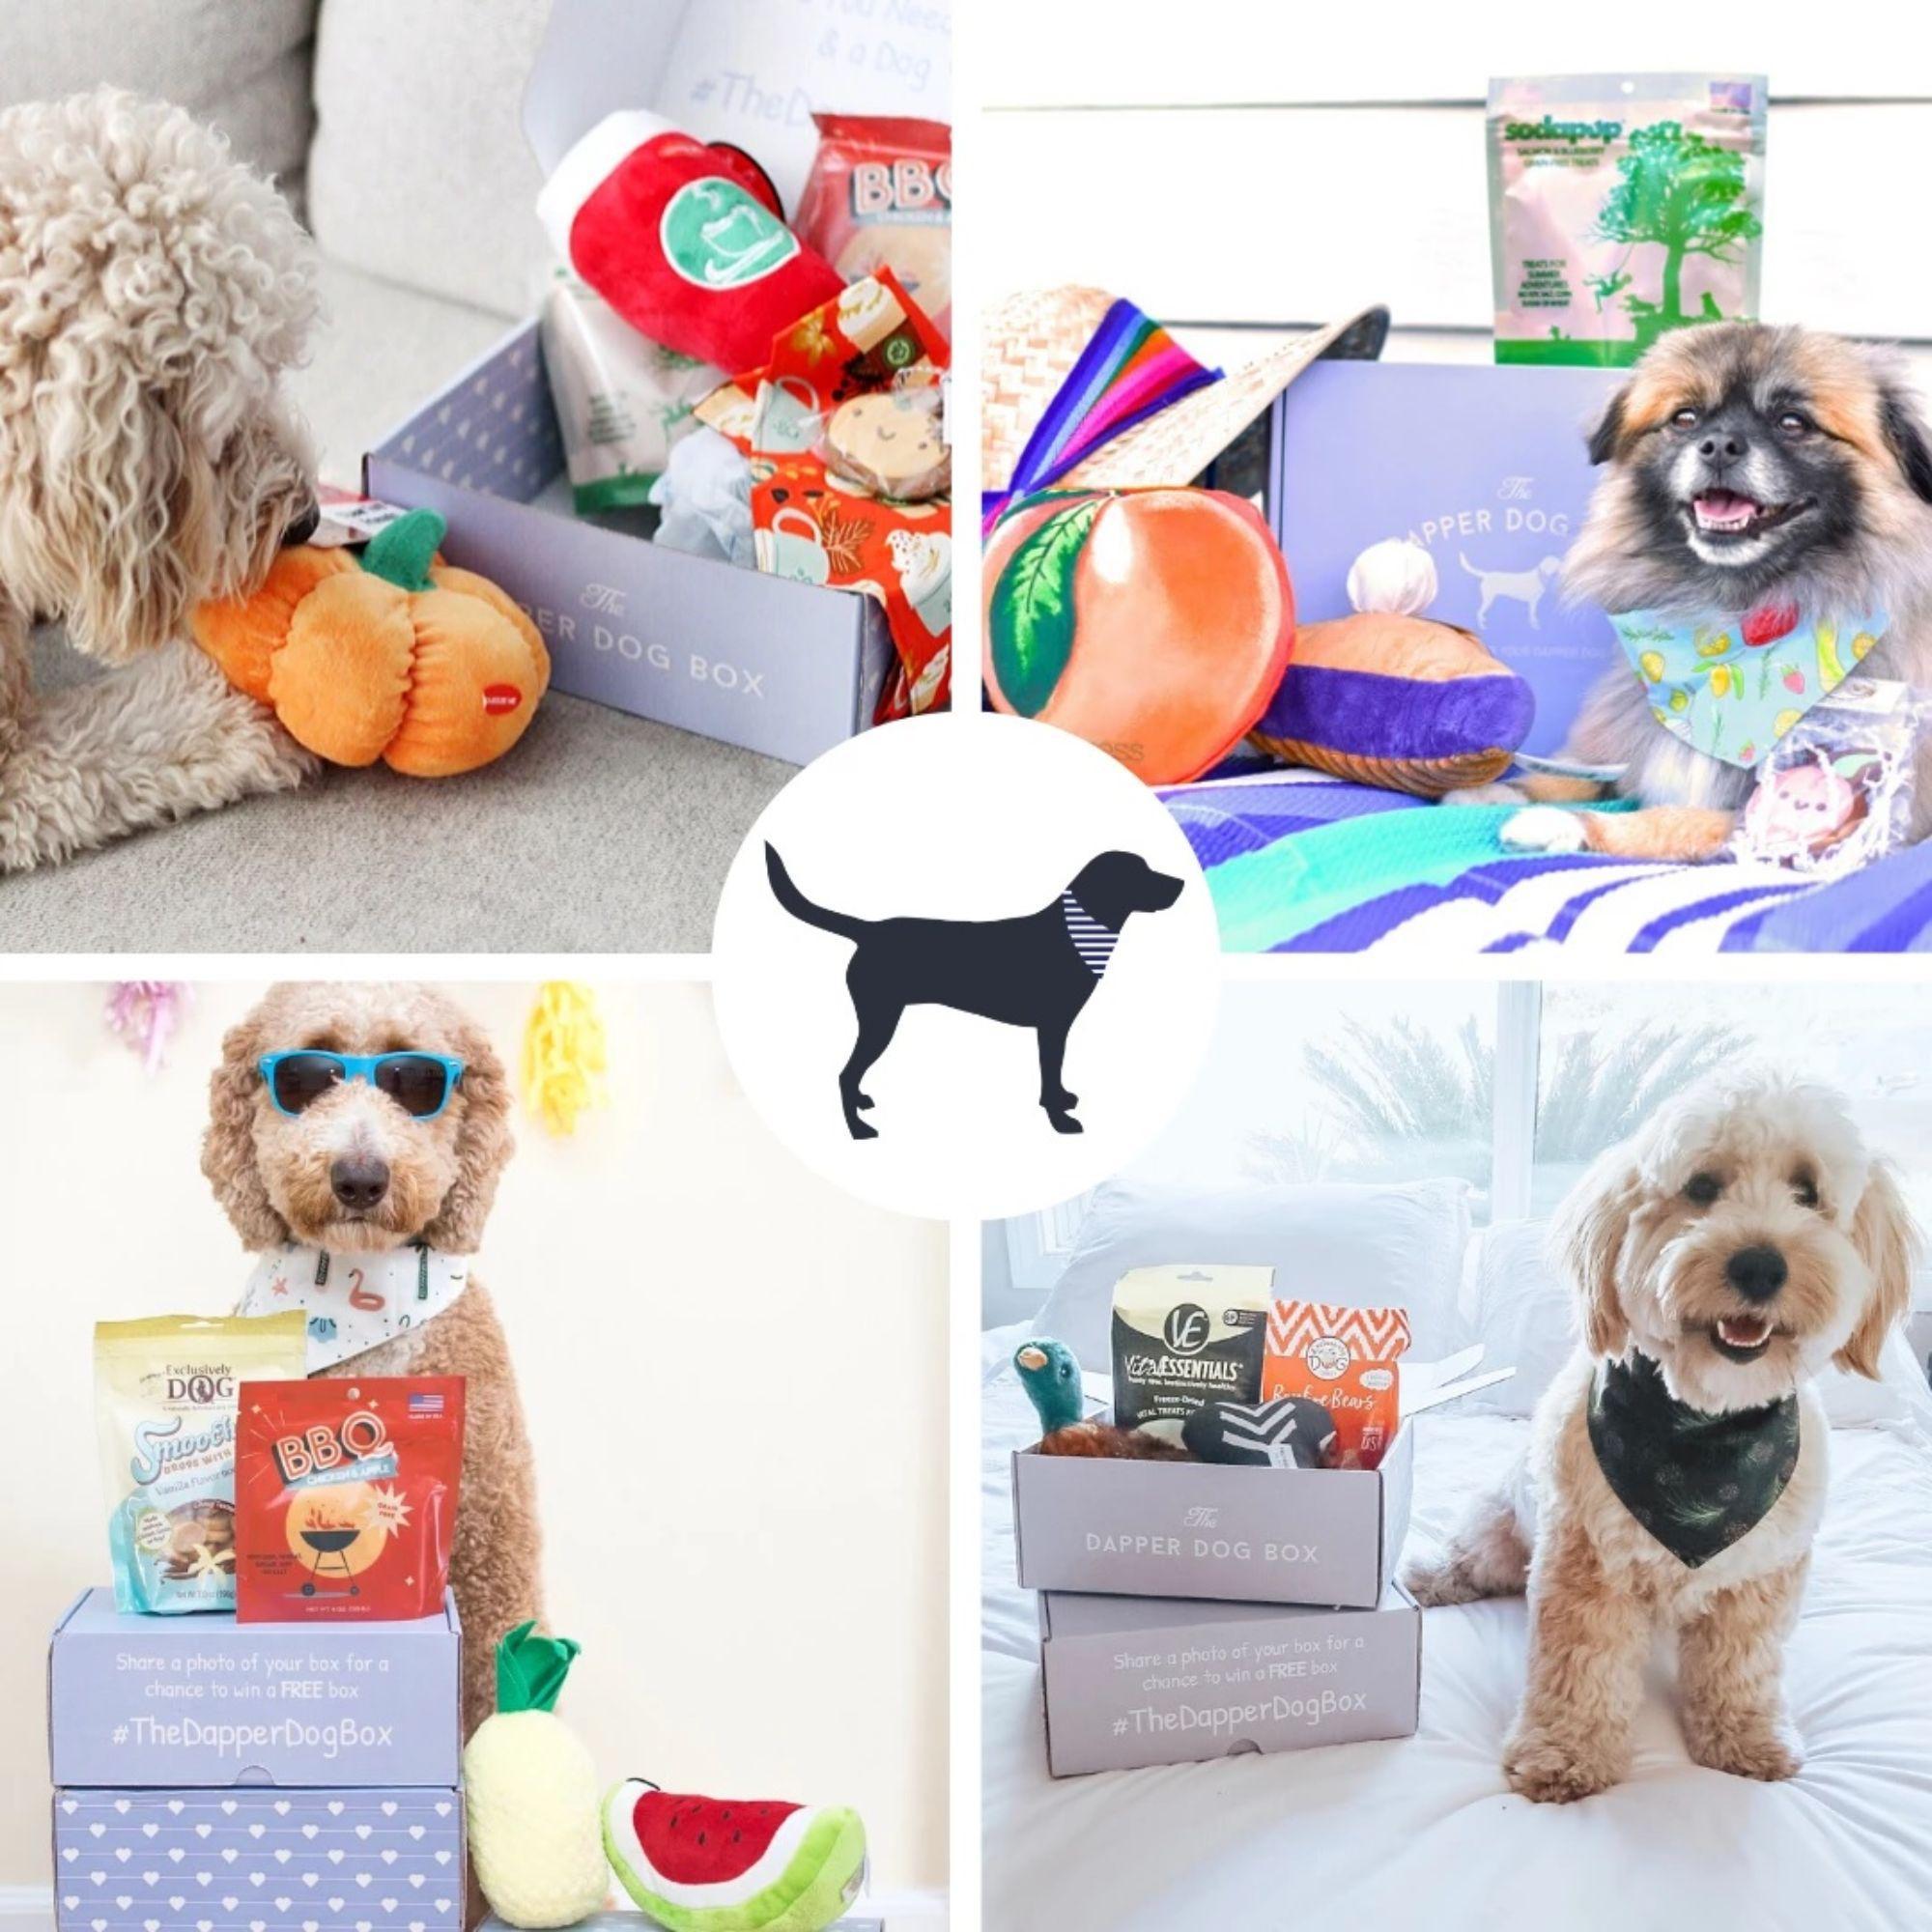 The Dapper Dog Subscription Box